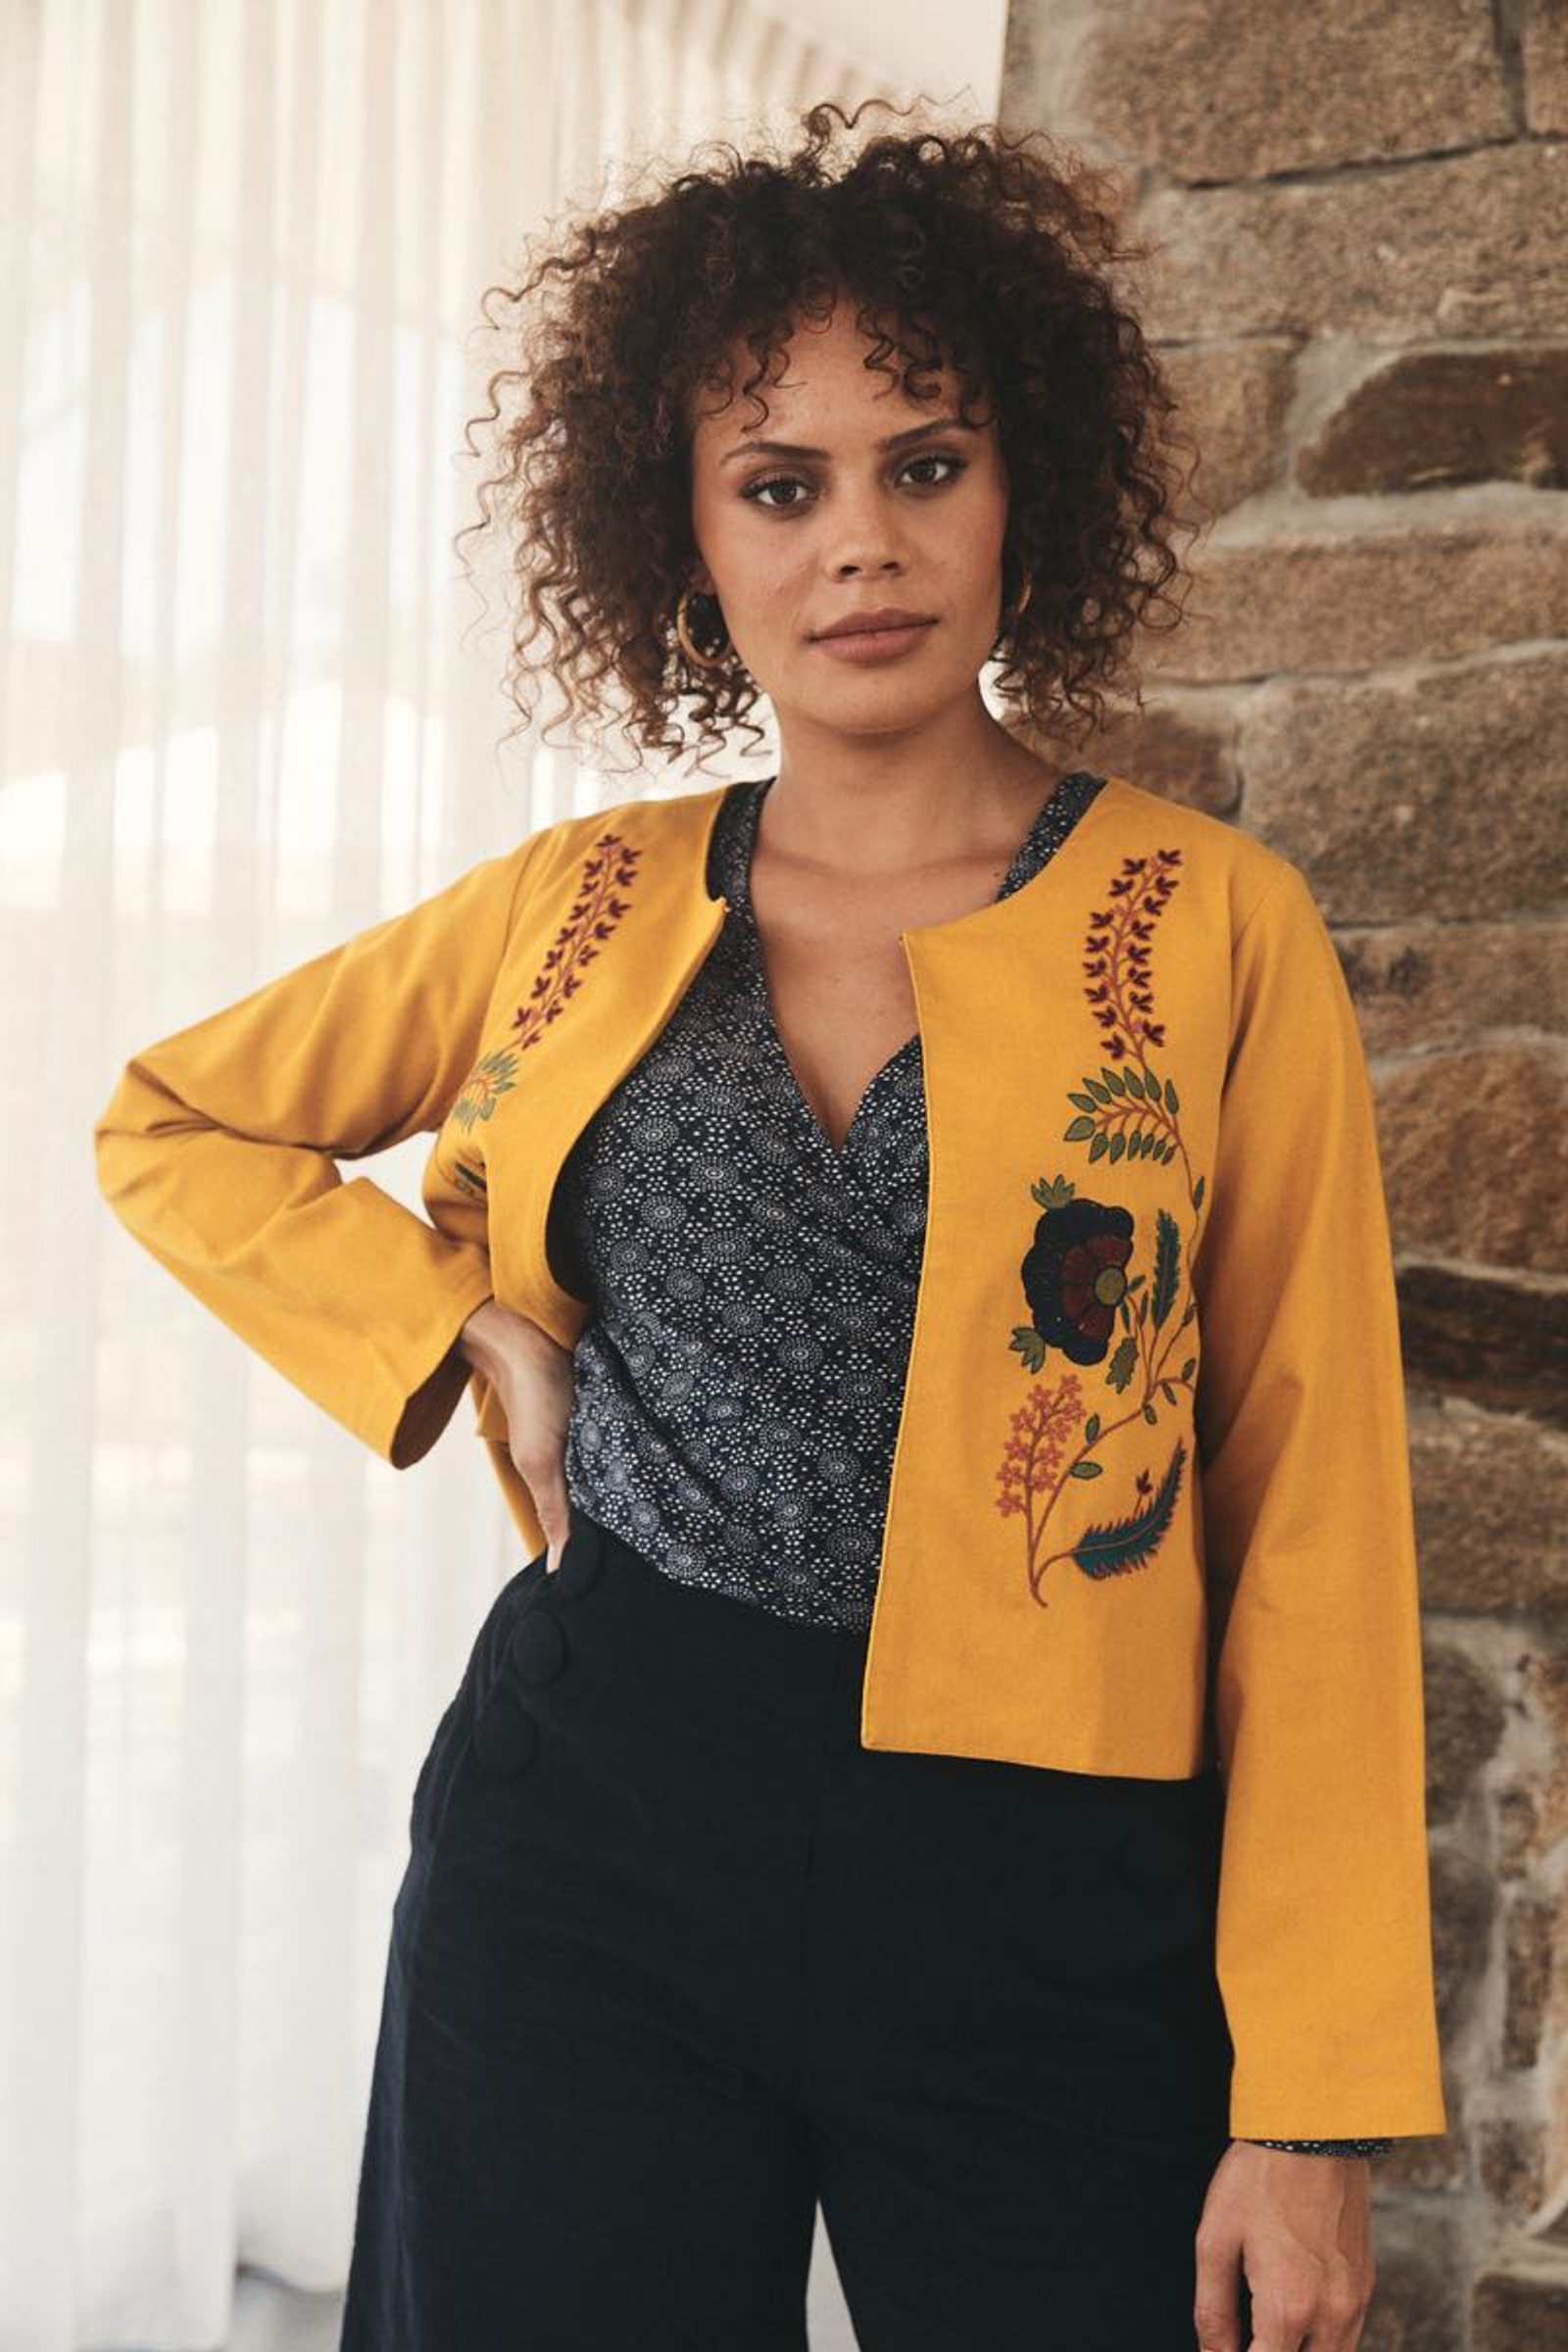 Priya Jacket Stitch - Embroidered